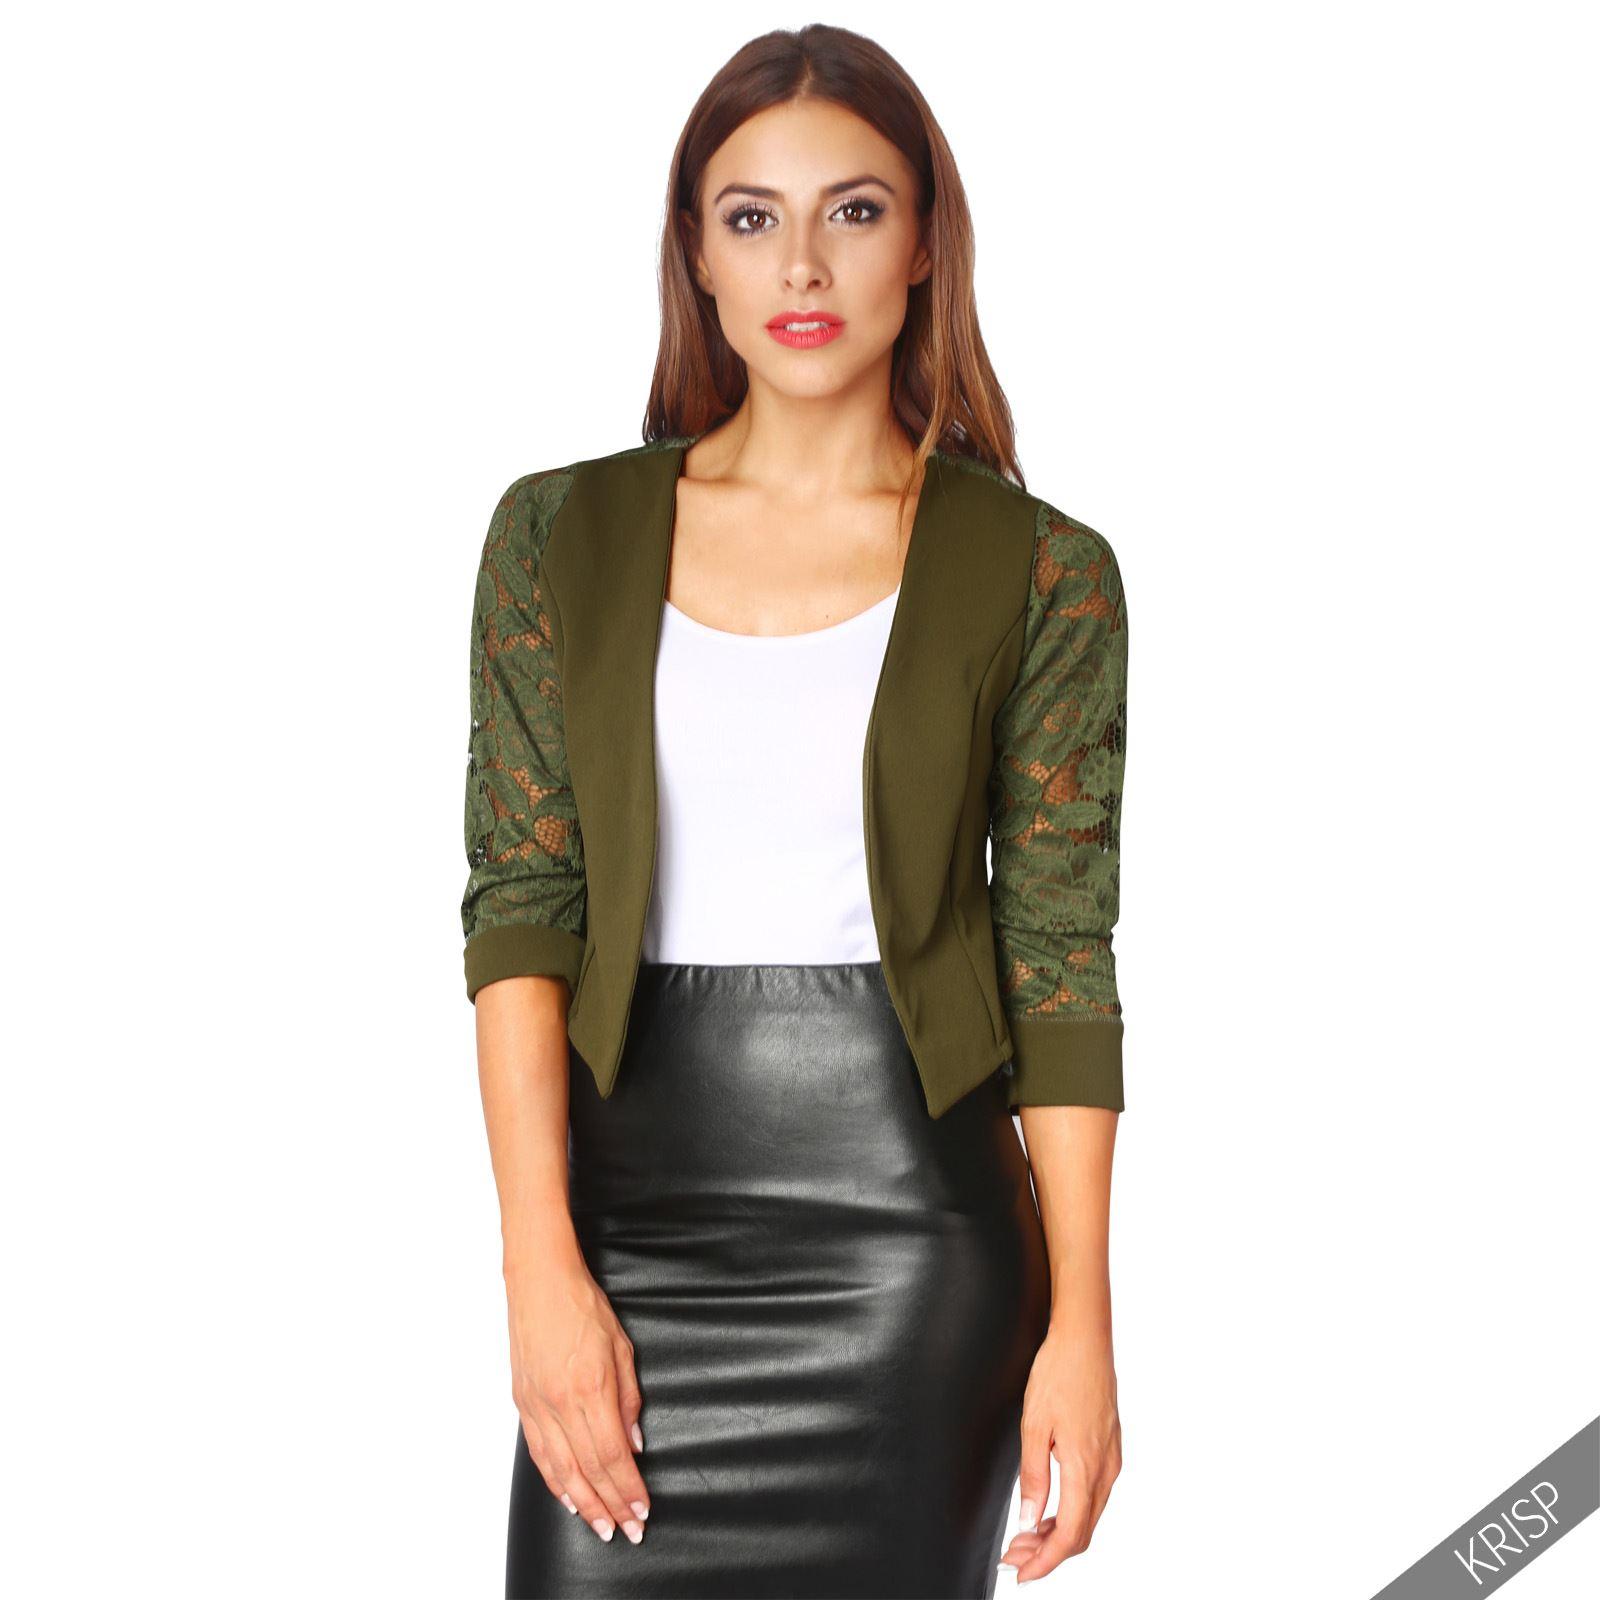 Womens-Ladies-Bolero-Lace-Shrug-Short-Sleeve-Cardigan-Cropped-Party-Top-Jacket thumbnail 8